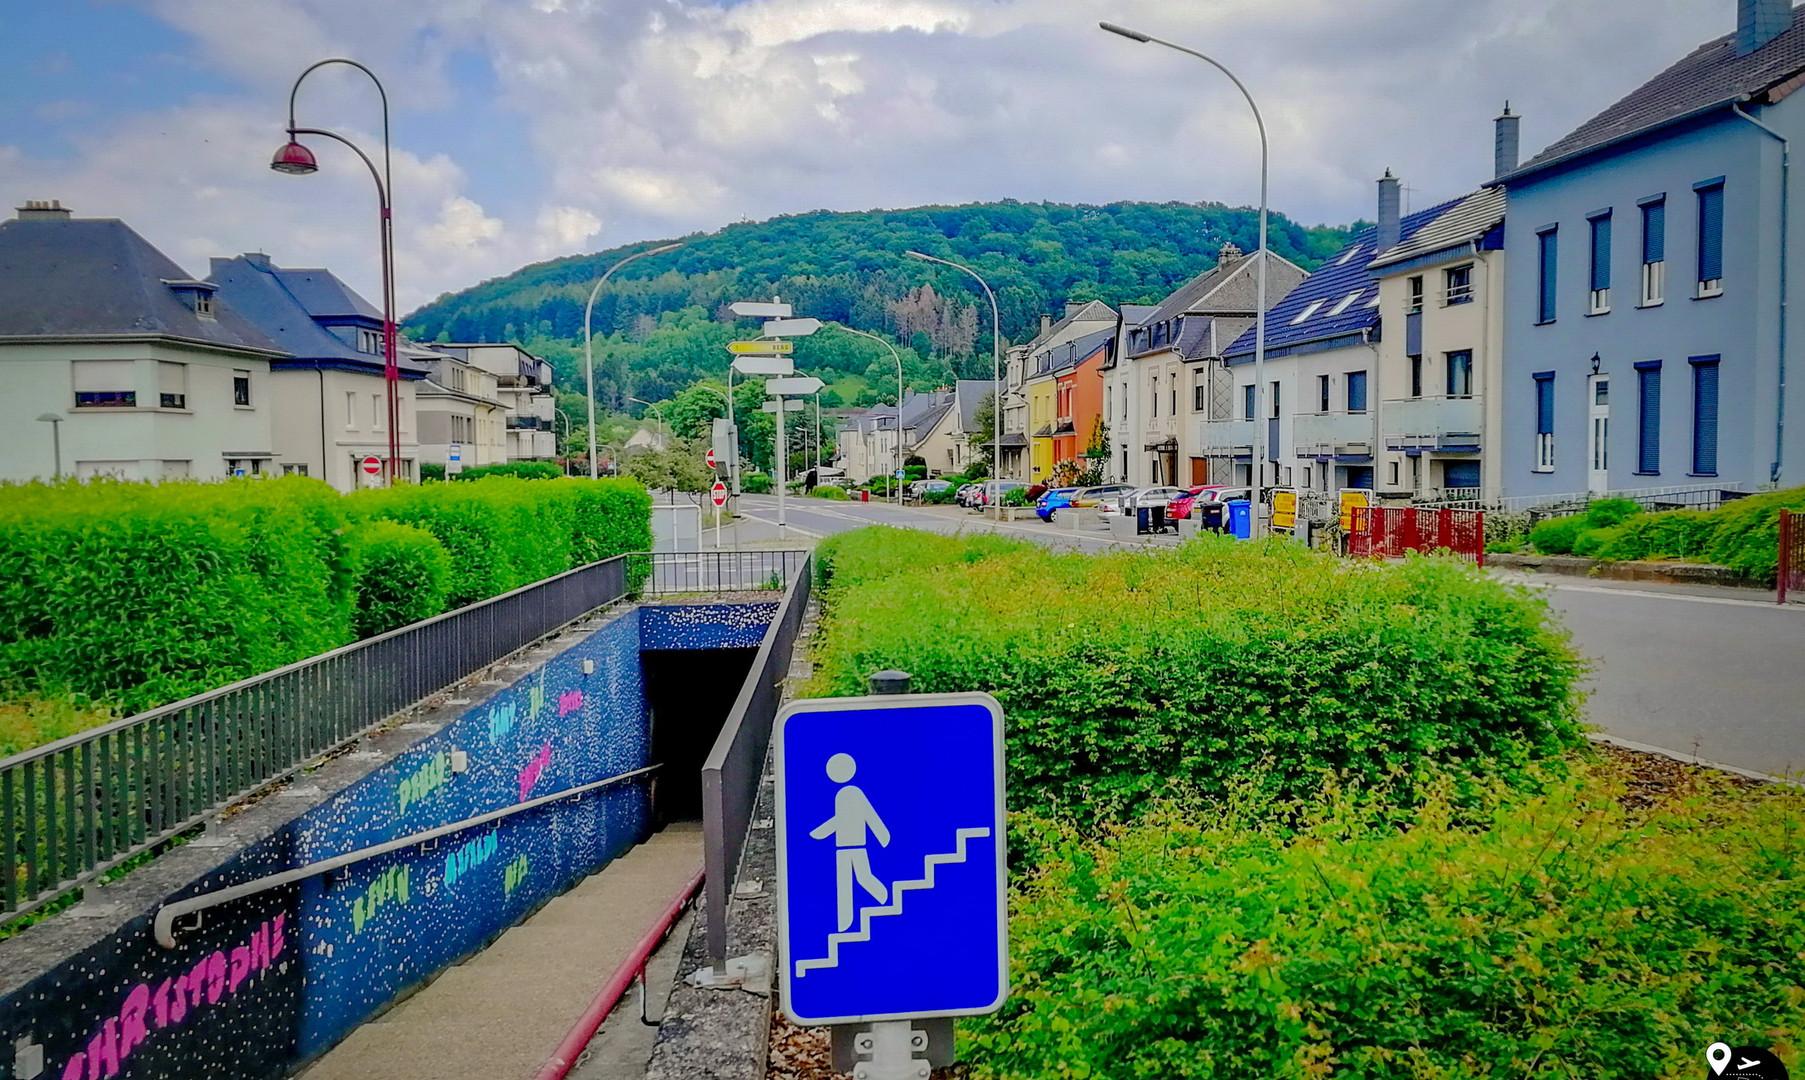 Поселение Кольмар, Люксембург